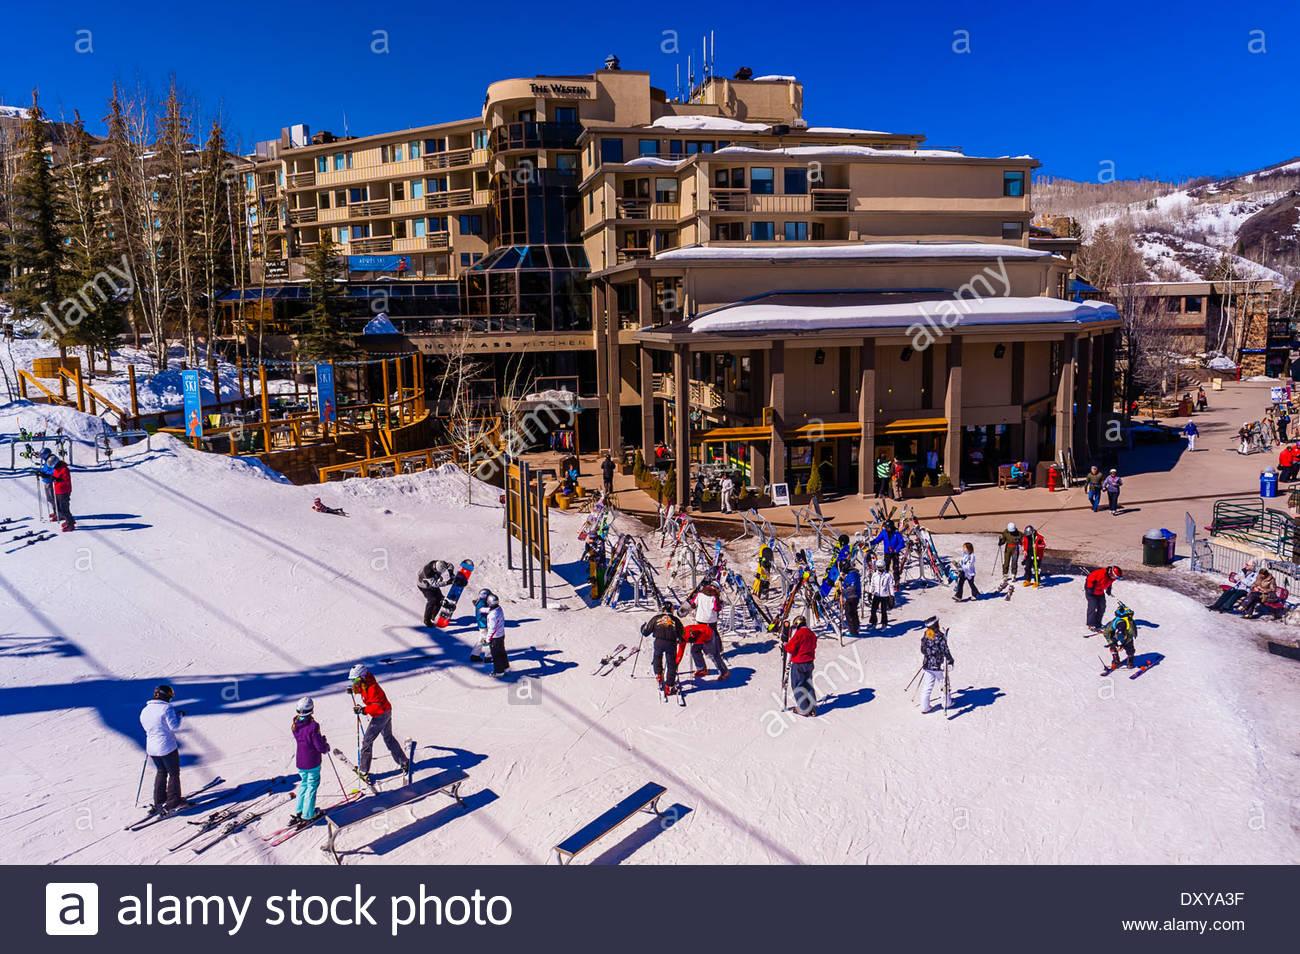 snowmass/aspen ski resort, snowmass village (aspen), colorado usa